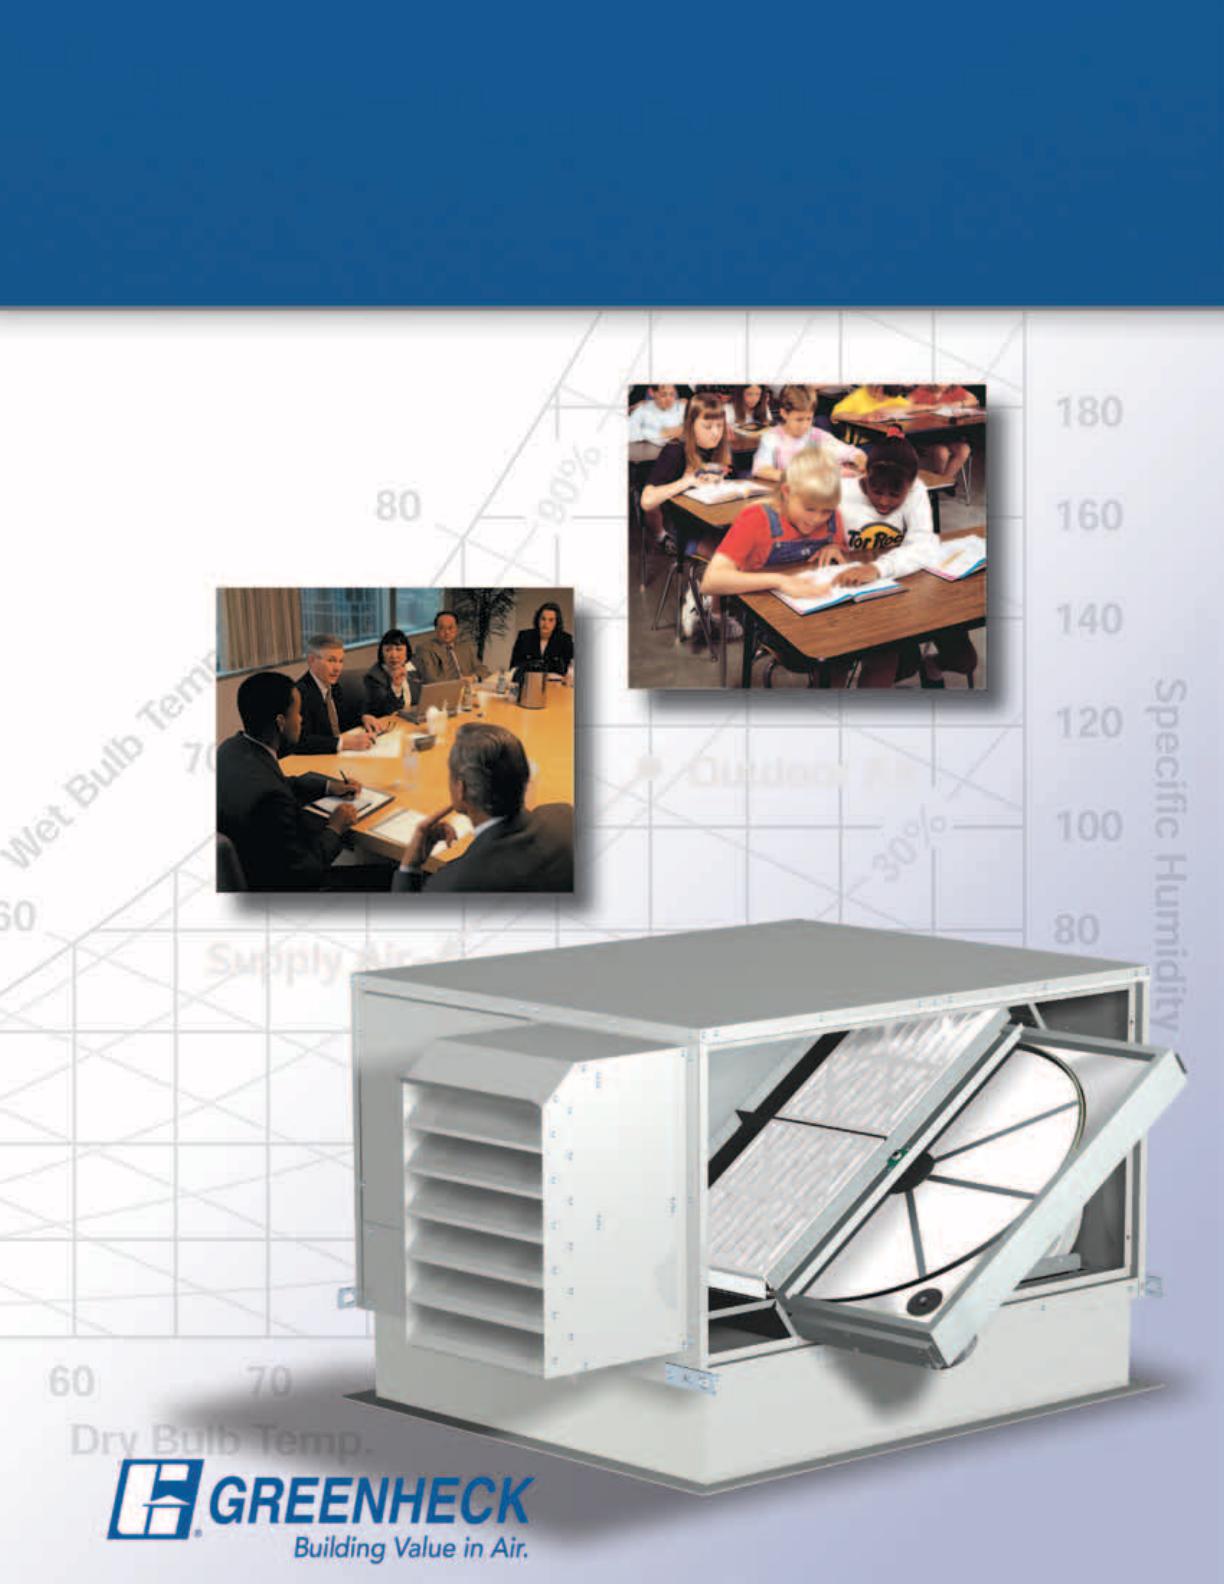 Greenheck Fan Energy Recovery Ventilator Erv Users Manual